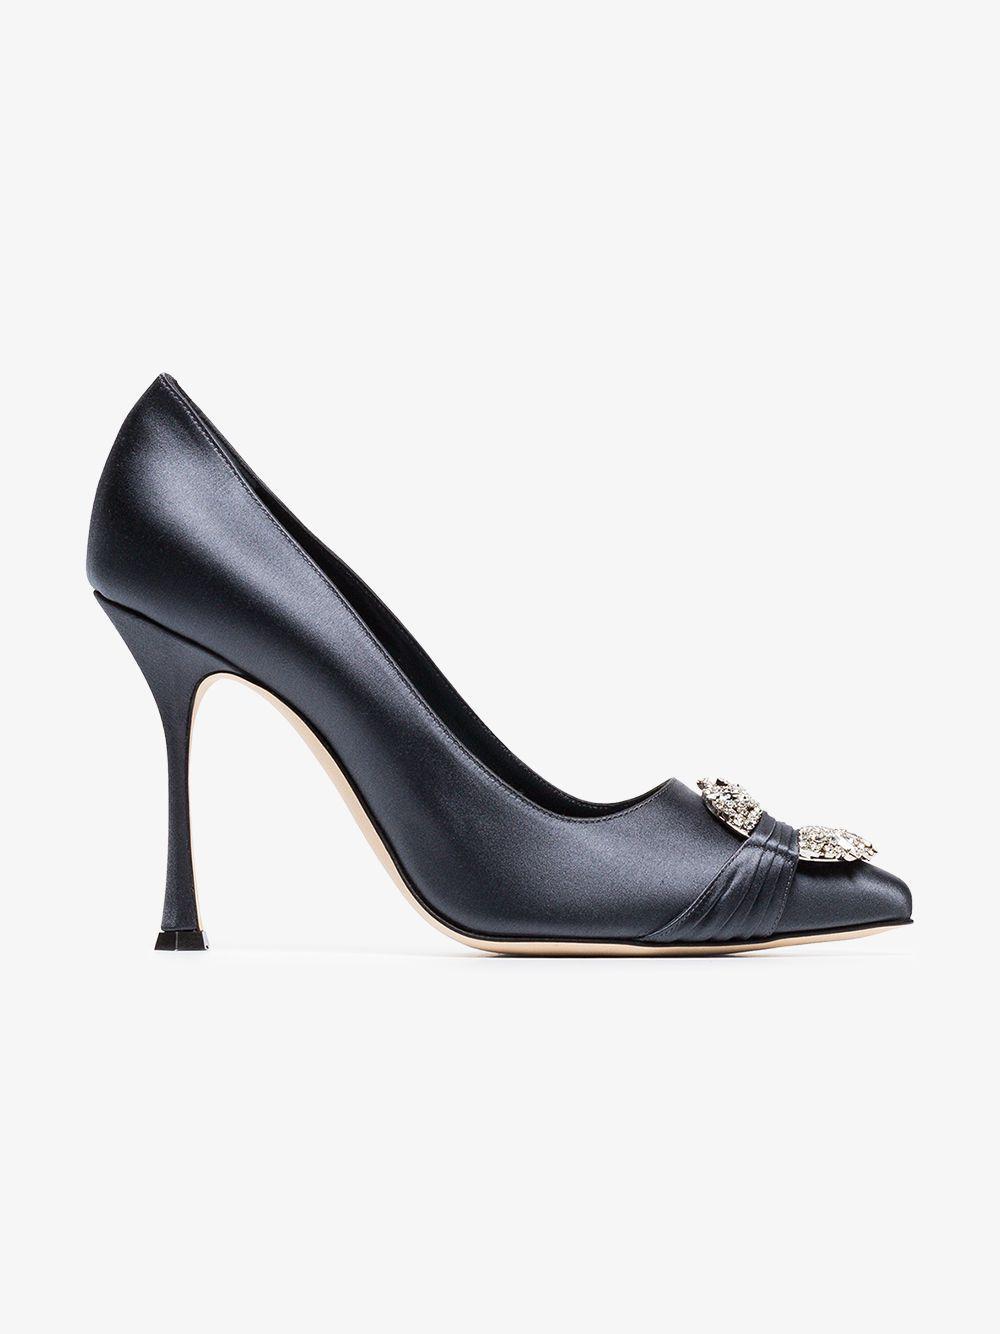 93e6a5d40e75 Manolo Blahnik - Blue Maidu 105 Satin Crystal Embellished Heels - Lyst.  View fullscreen